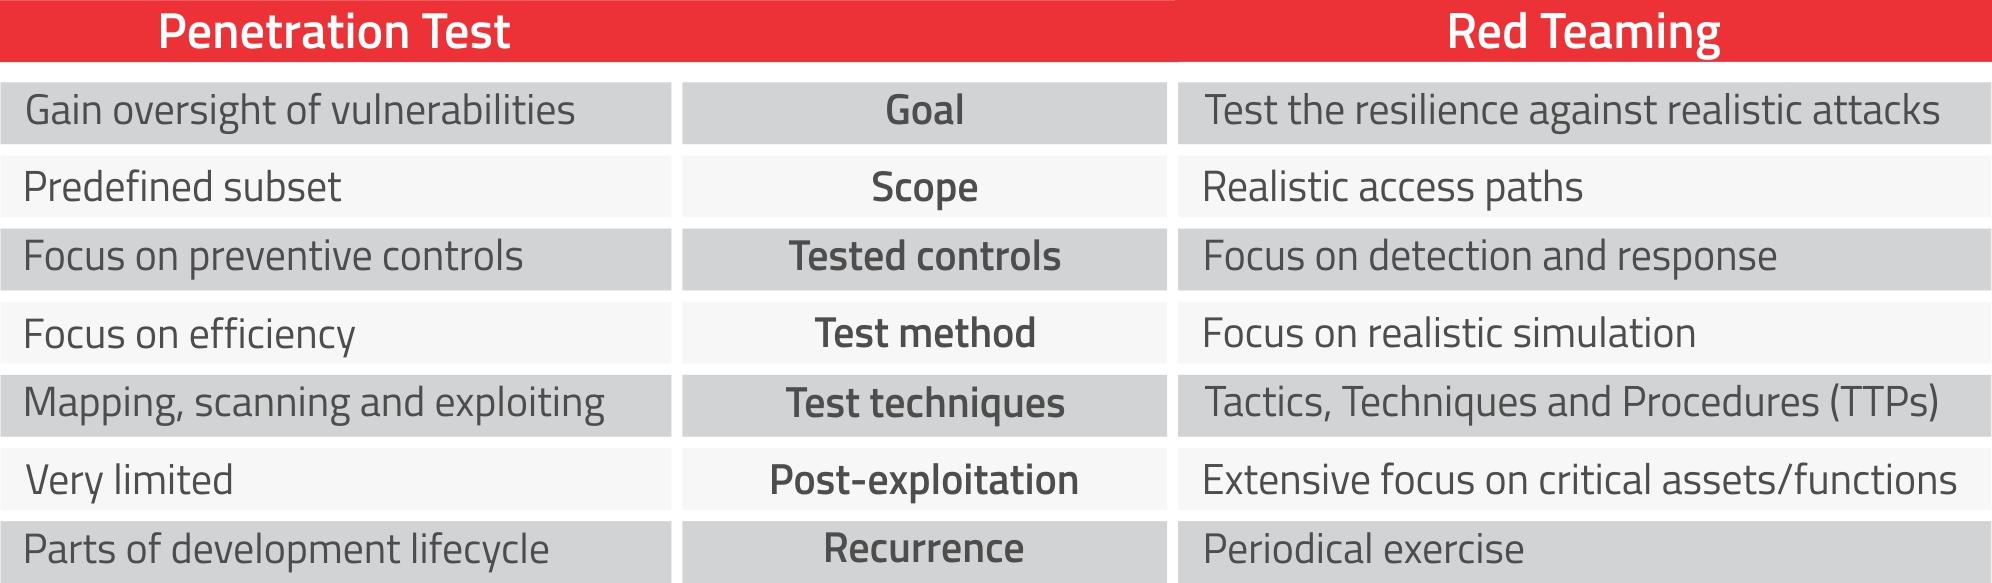 penetration test vs red teaming